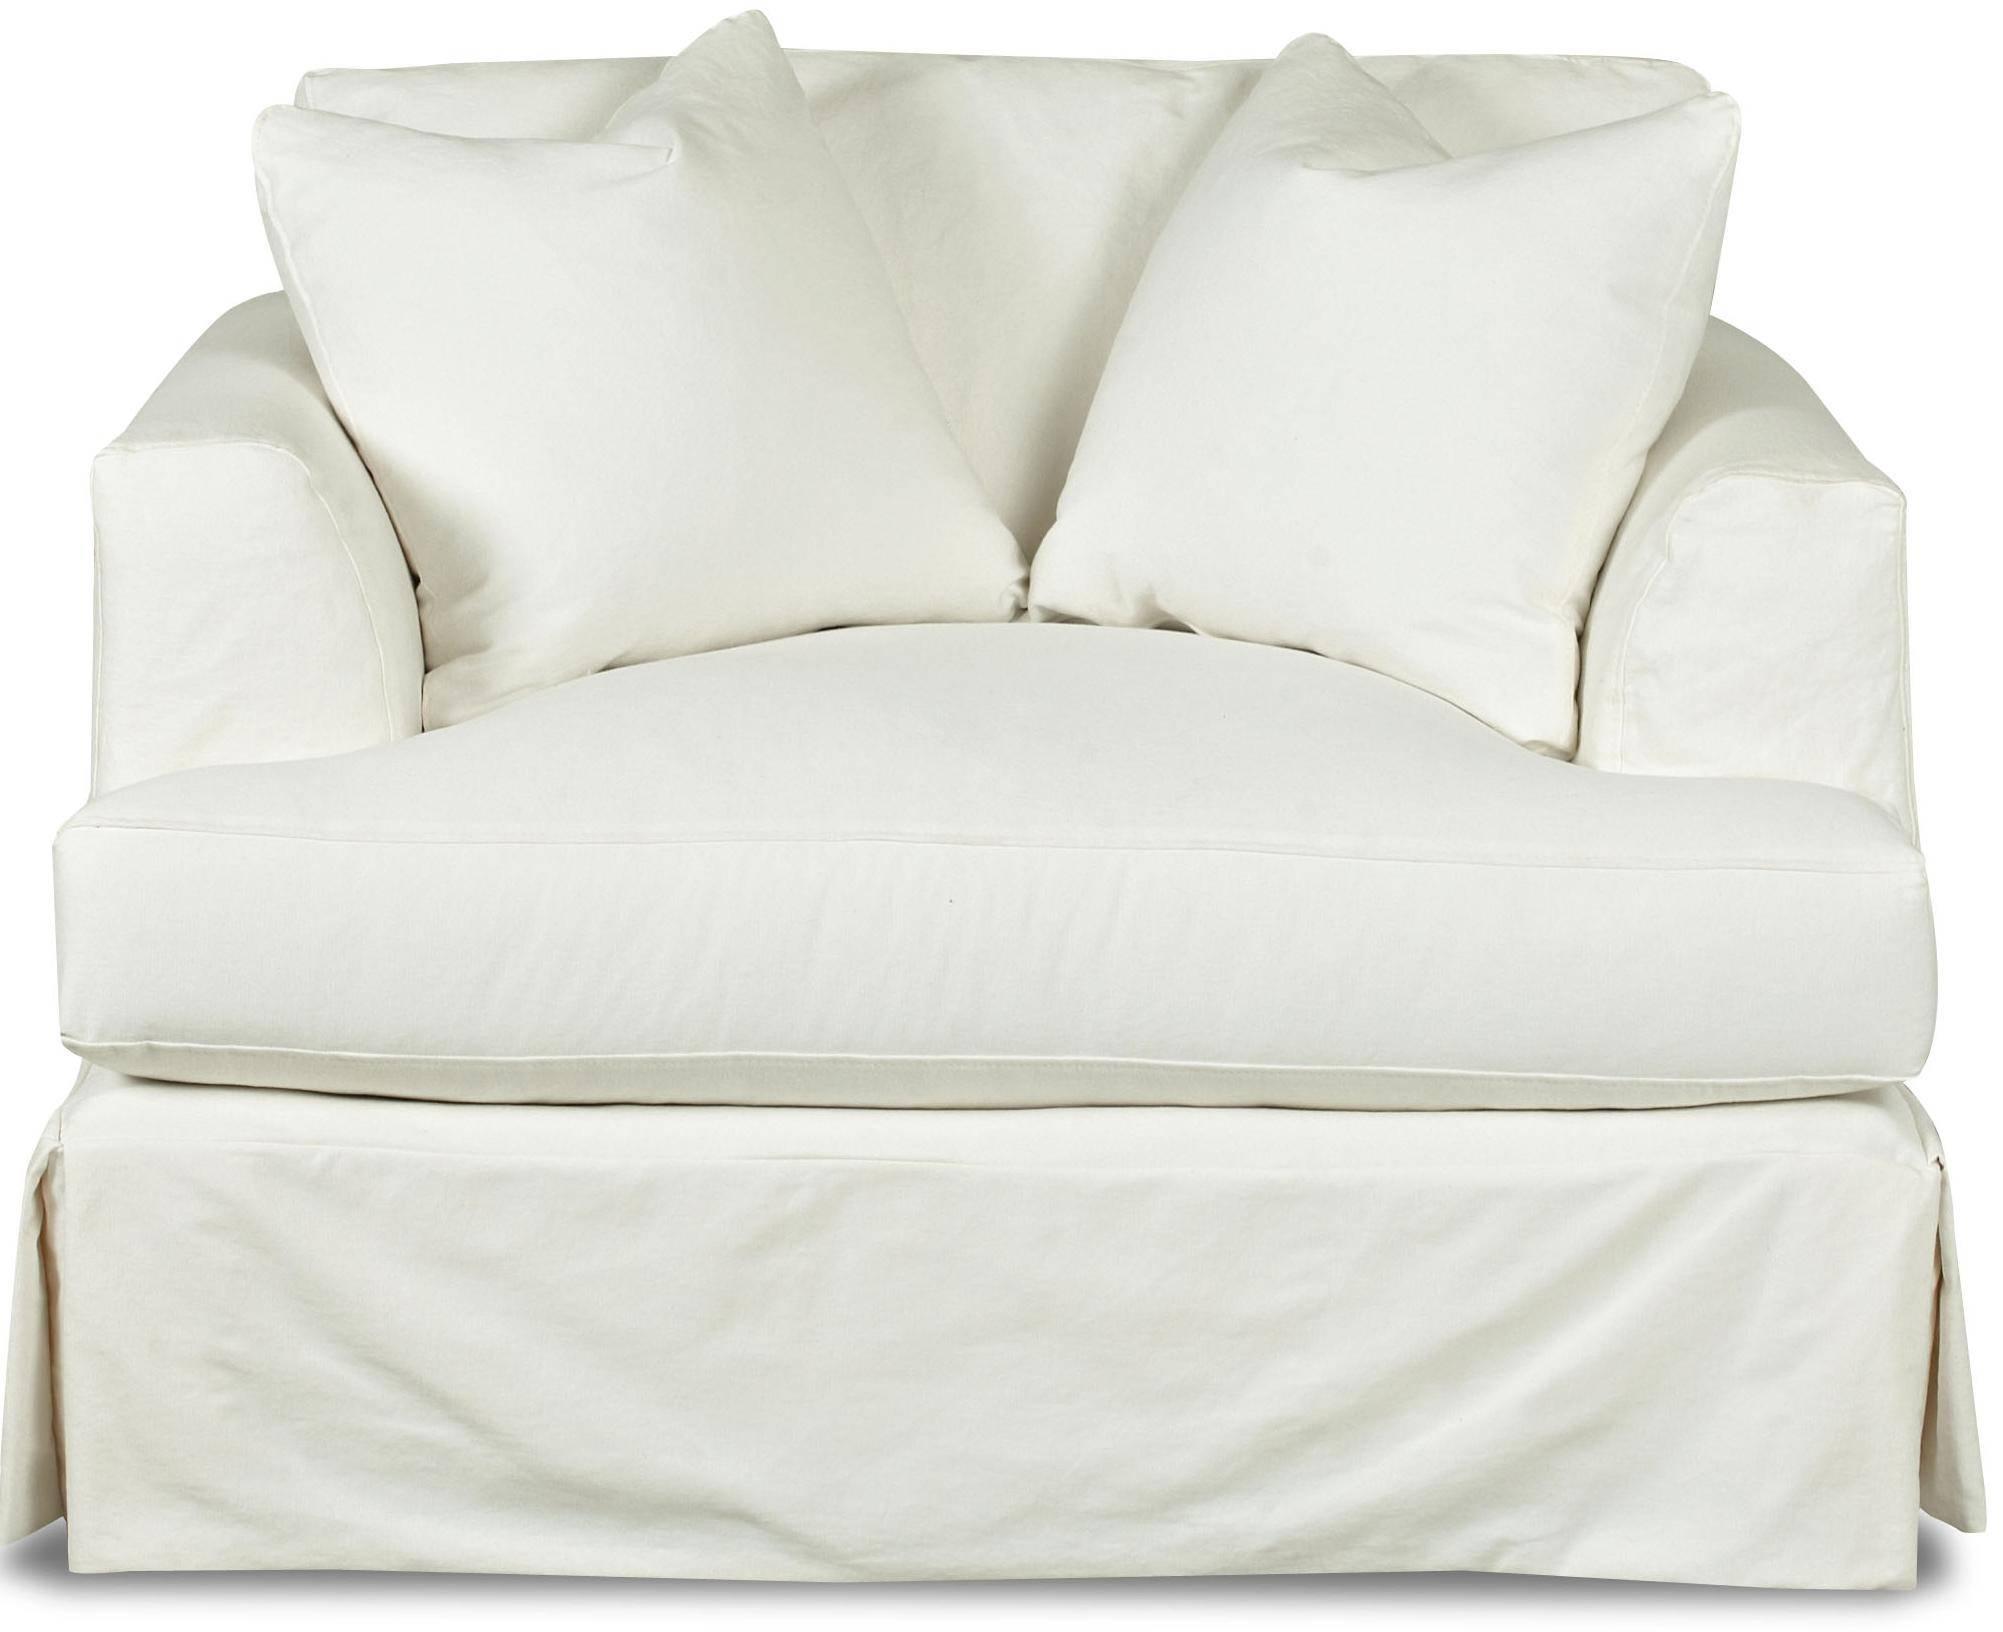 Sofas Center : 47 Unique Oversized Sofa Slipcover Photo Concept pertaining to Large Sofa Slipcovers (Image 17 of 30)